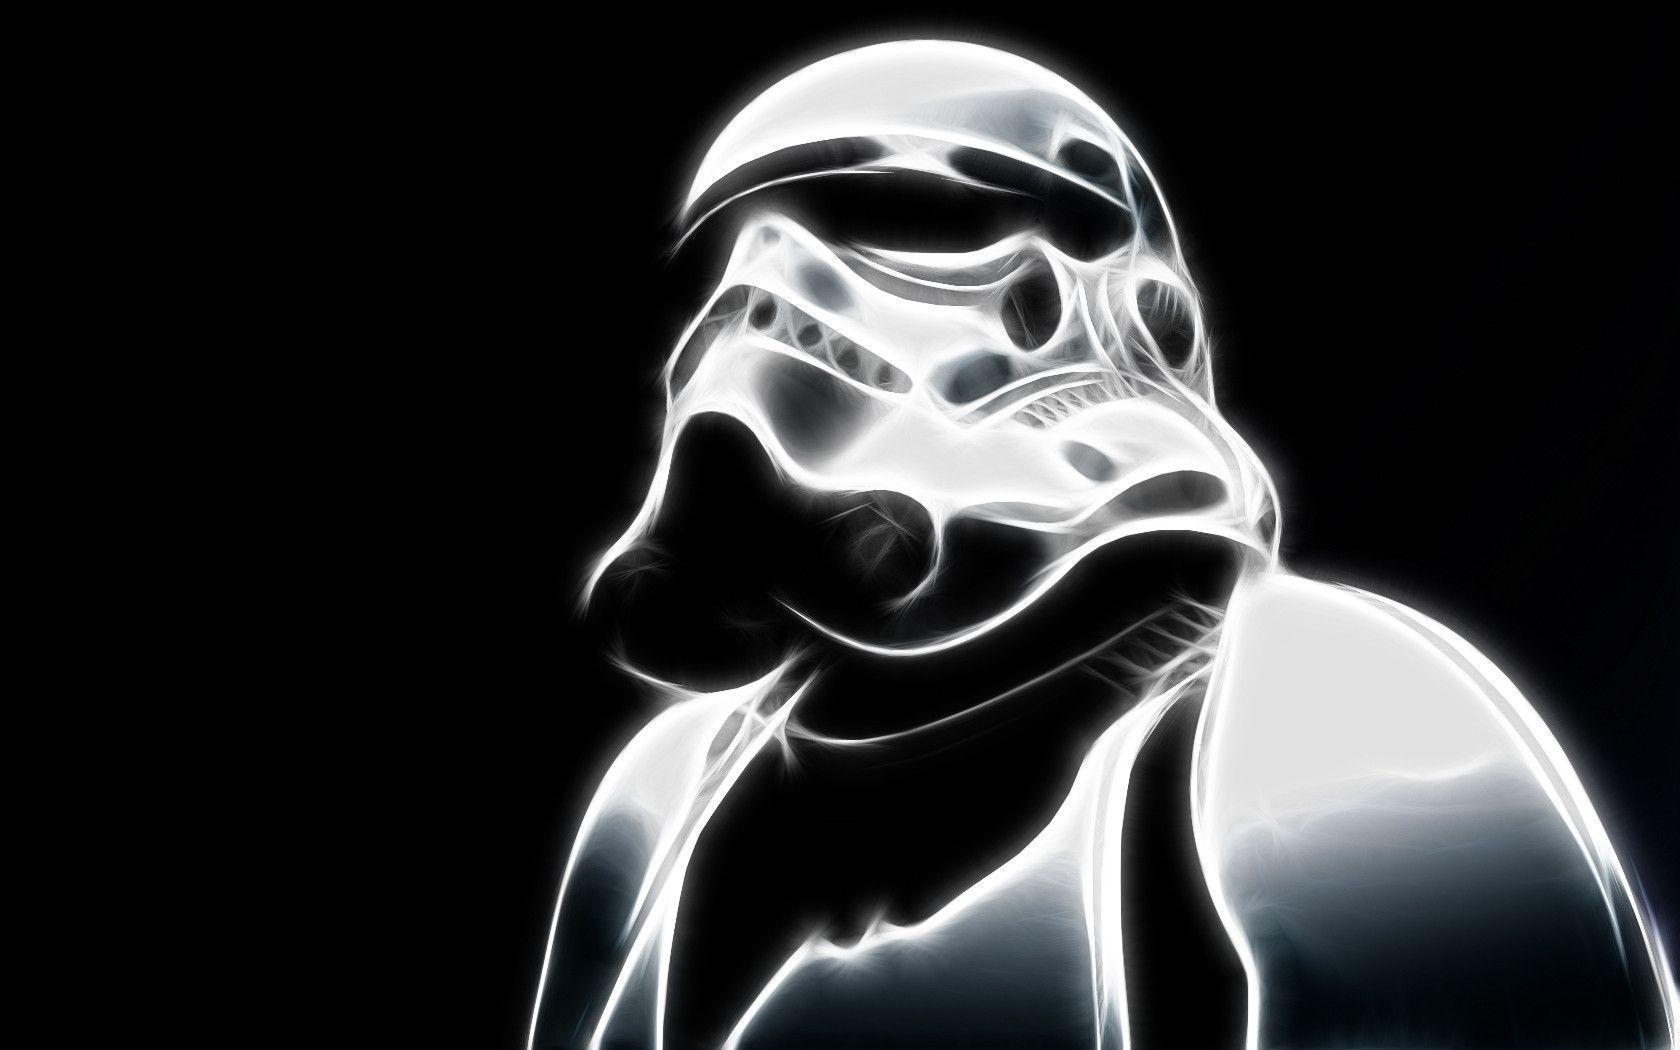 epic star wars trooper wallpaper - photo #3